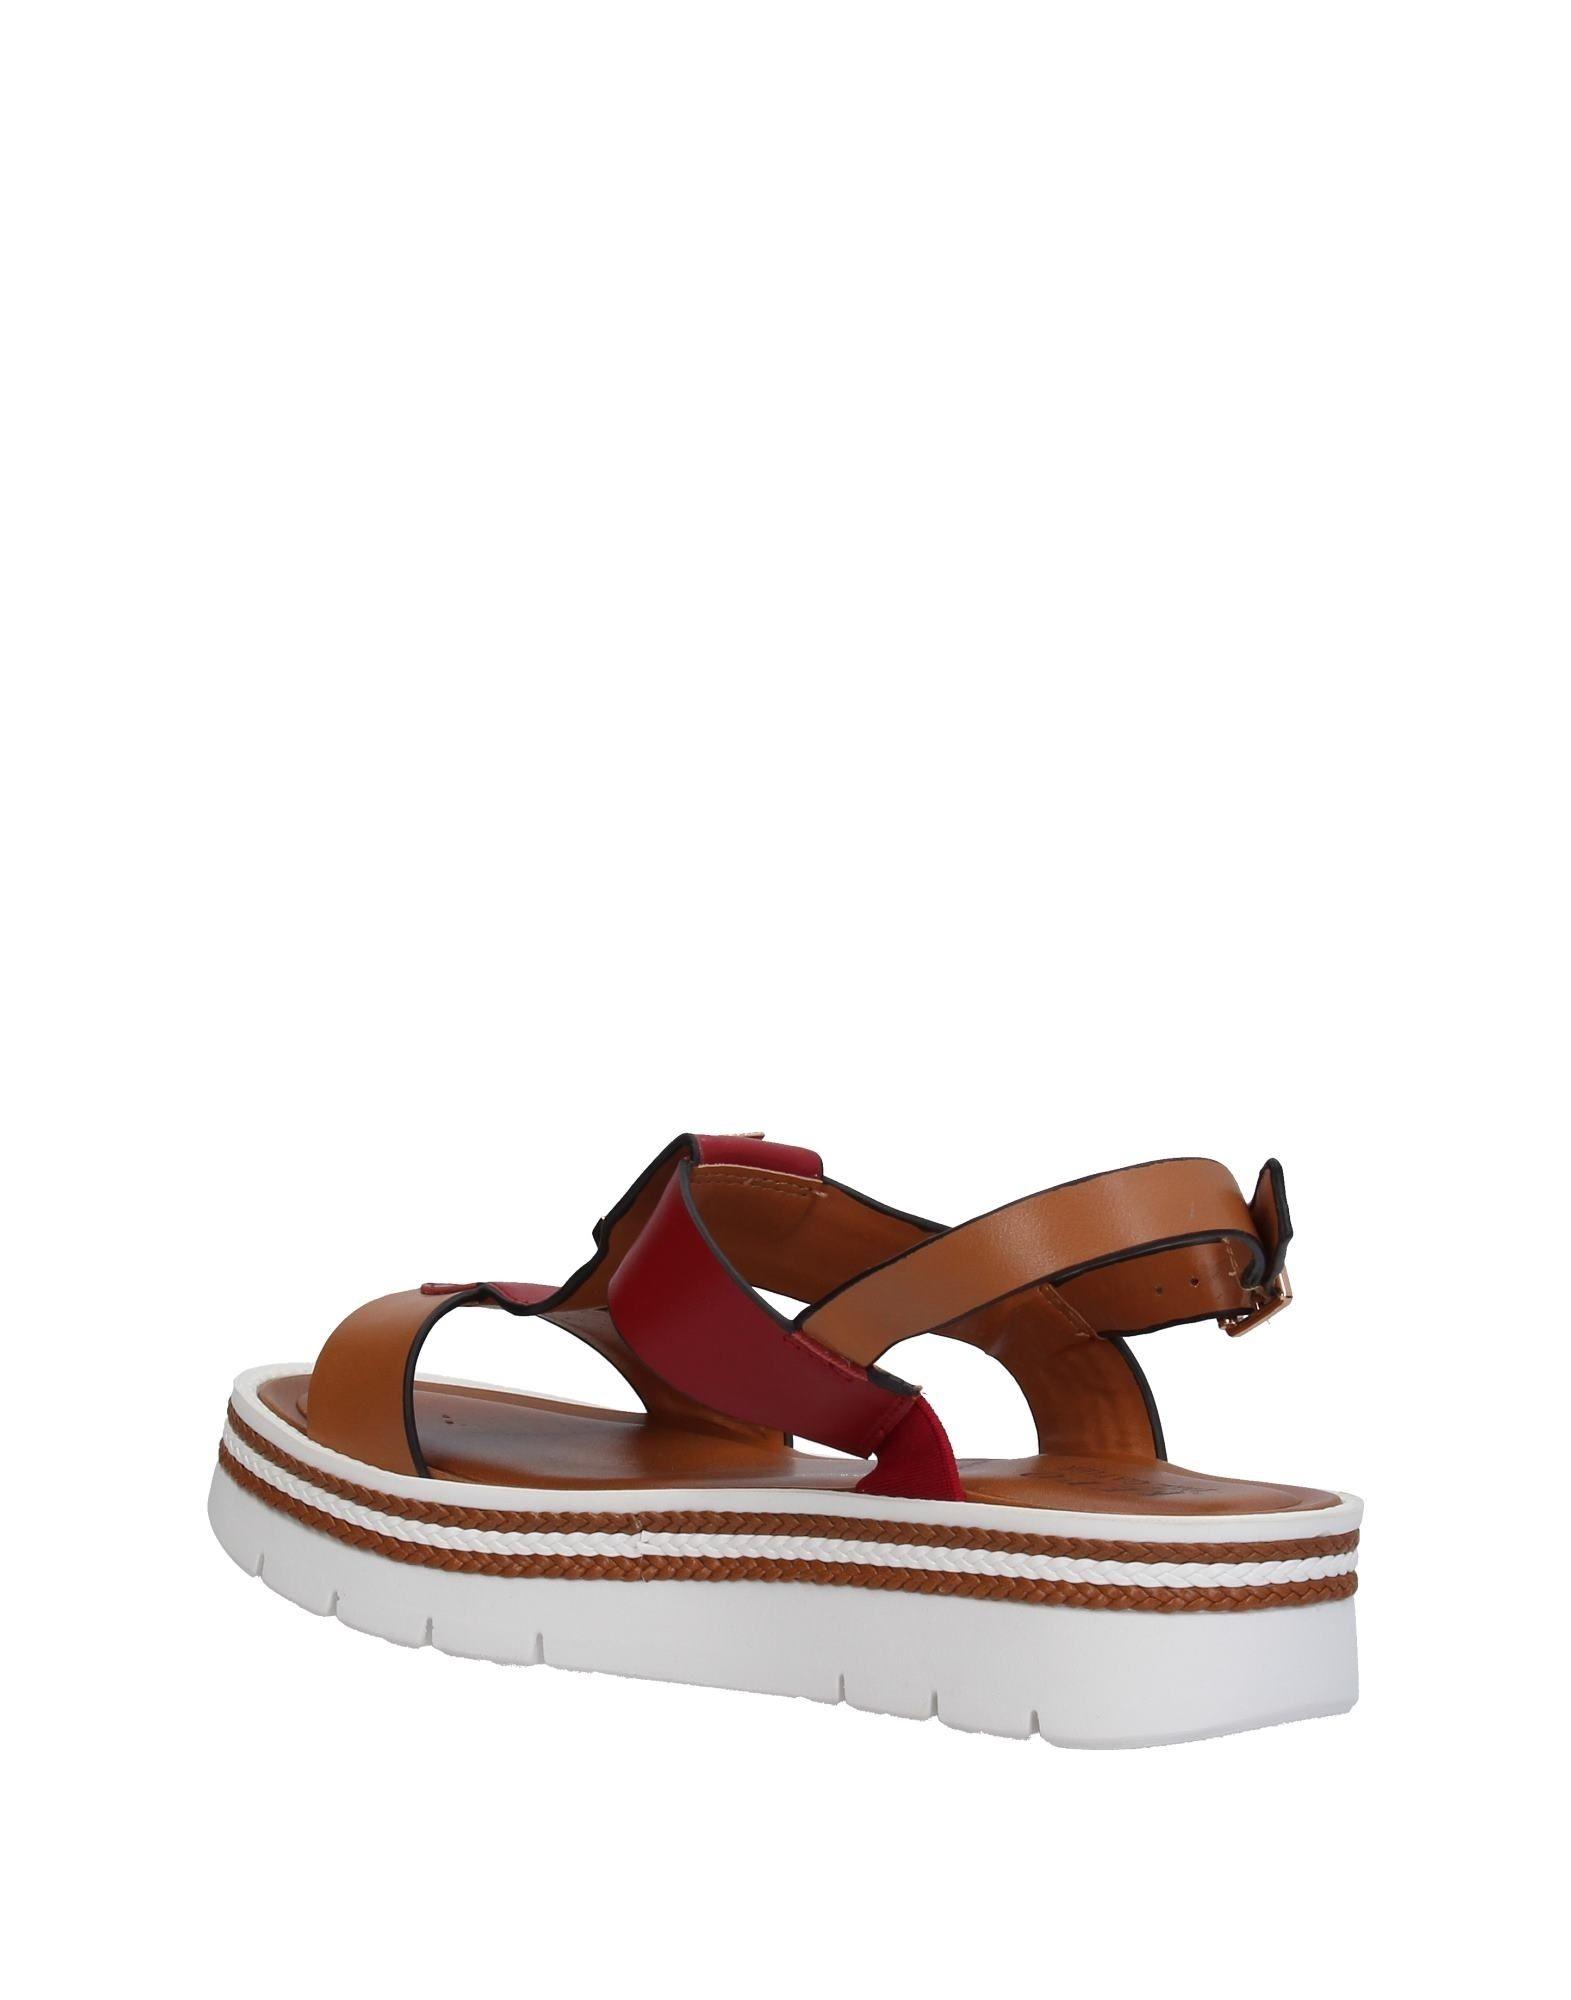 Phil Gatièr By Repo Sandalen Damen  Schuhe 11394732SC Gute Qualität beliebte Schuhe  ff8ef2